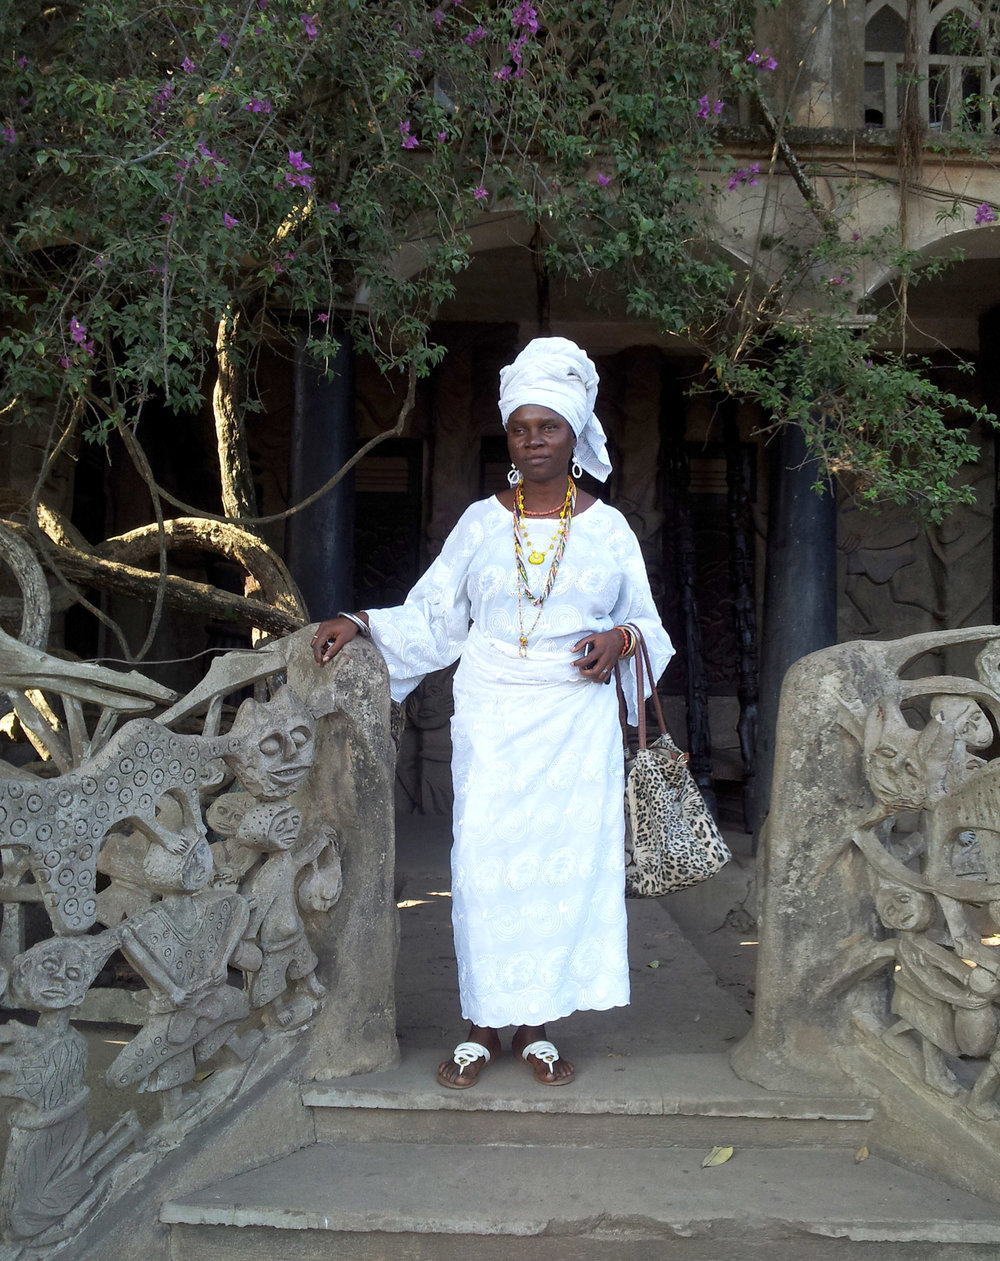 Oshun priestess Adedoyin Faniyi Olosun, Susanne Wenger's daughter, at Ibokún Road, 2015.